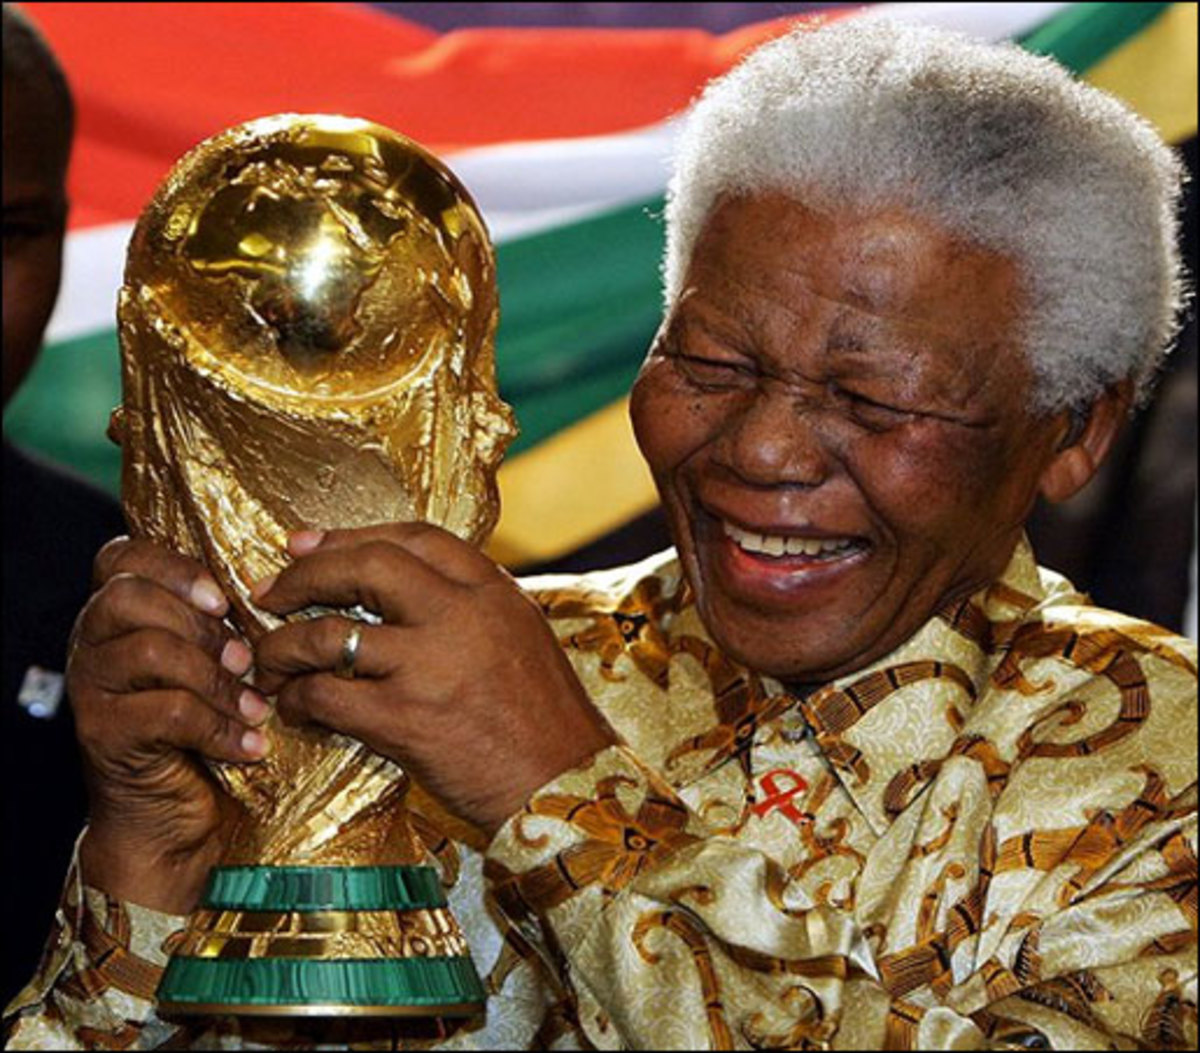 Nelson  Rolihlahla Madiba Mandela holding a model of the World Cup